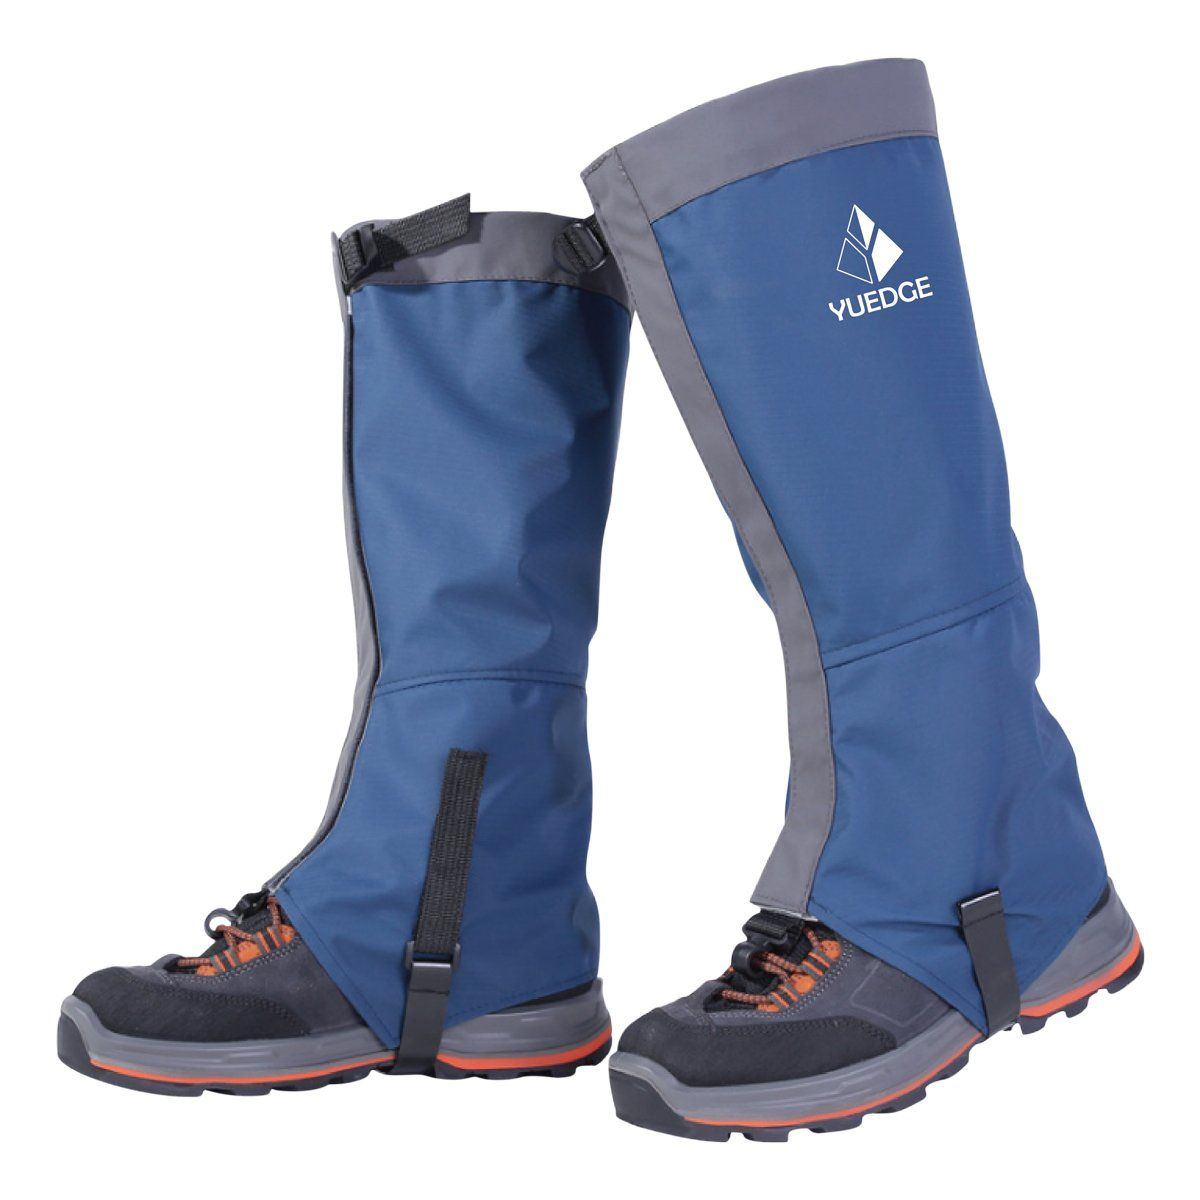 Outdoor Snow Camo Legging Gaiters Climbing Waterproof Leg Protection Guard